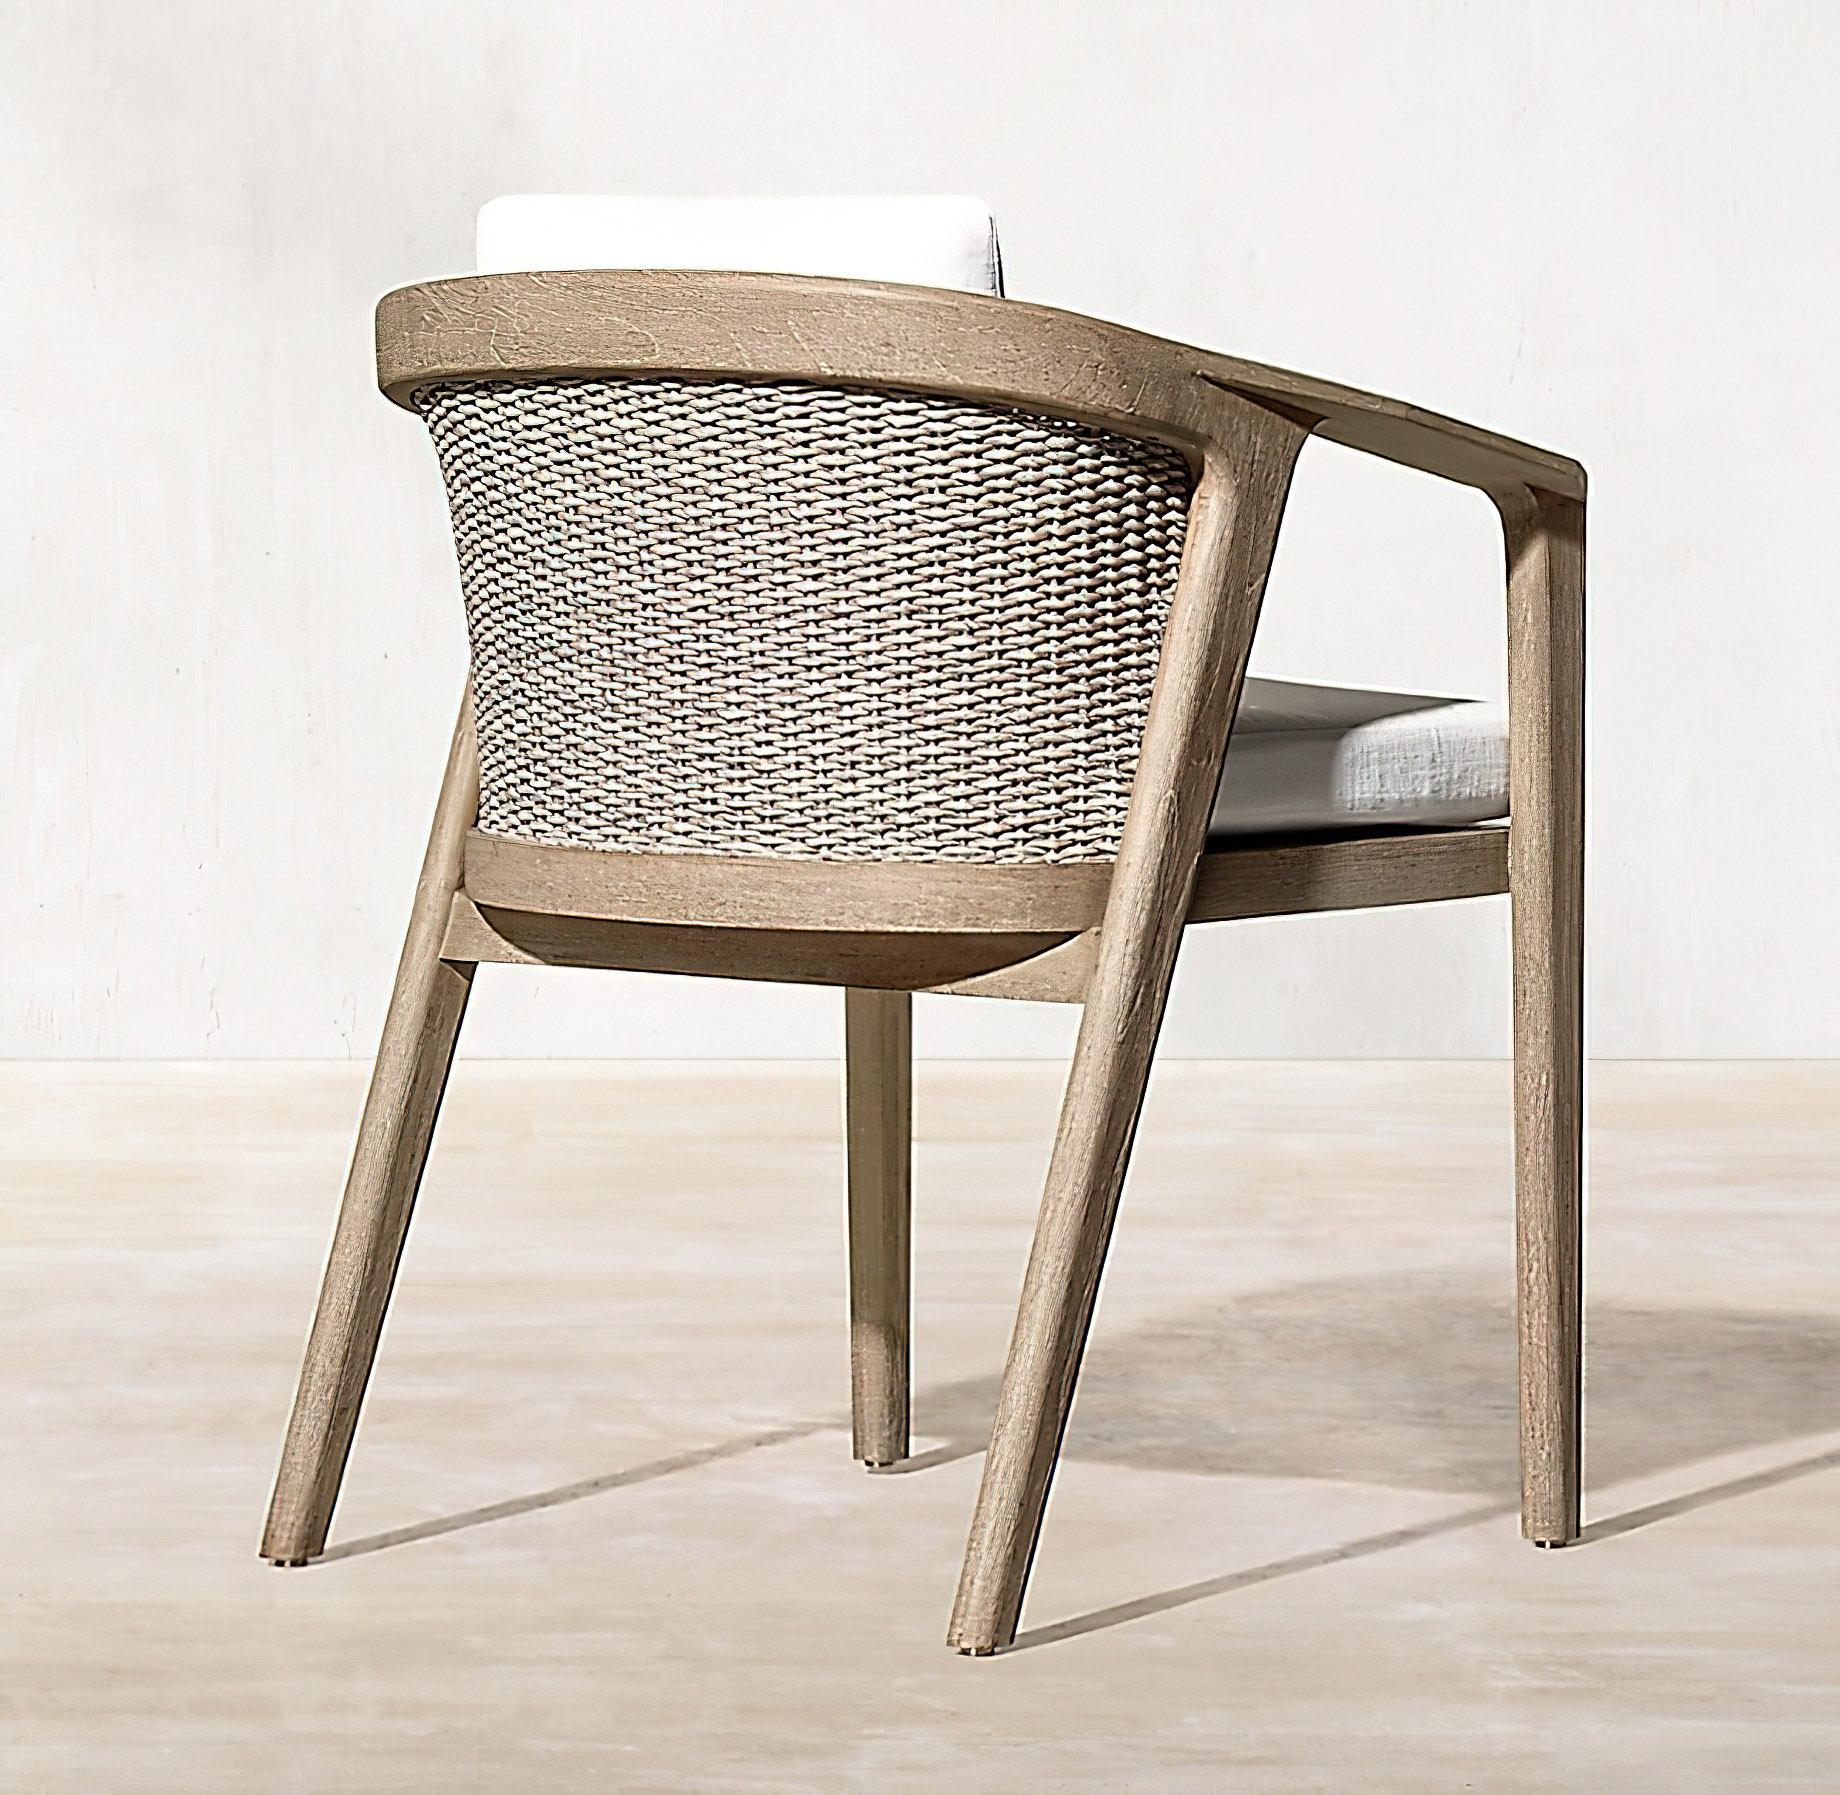 Malta Teak Collection Outdoor Furniture Design for RH – Ramon Esteve – Malta Teak Armchair